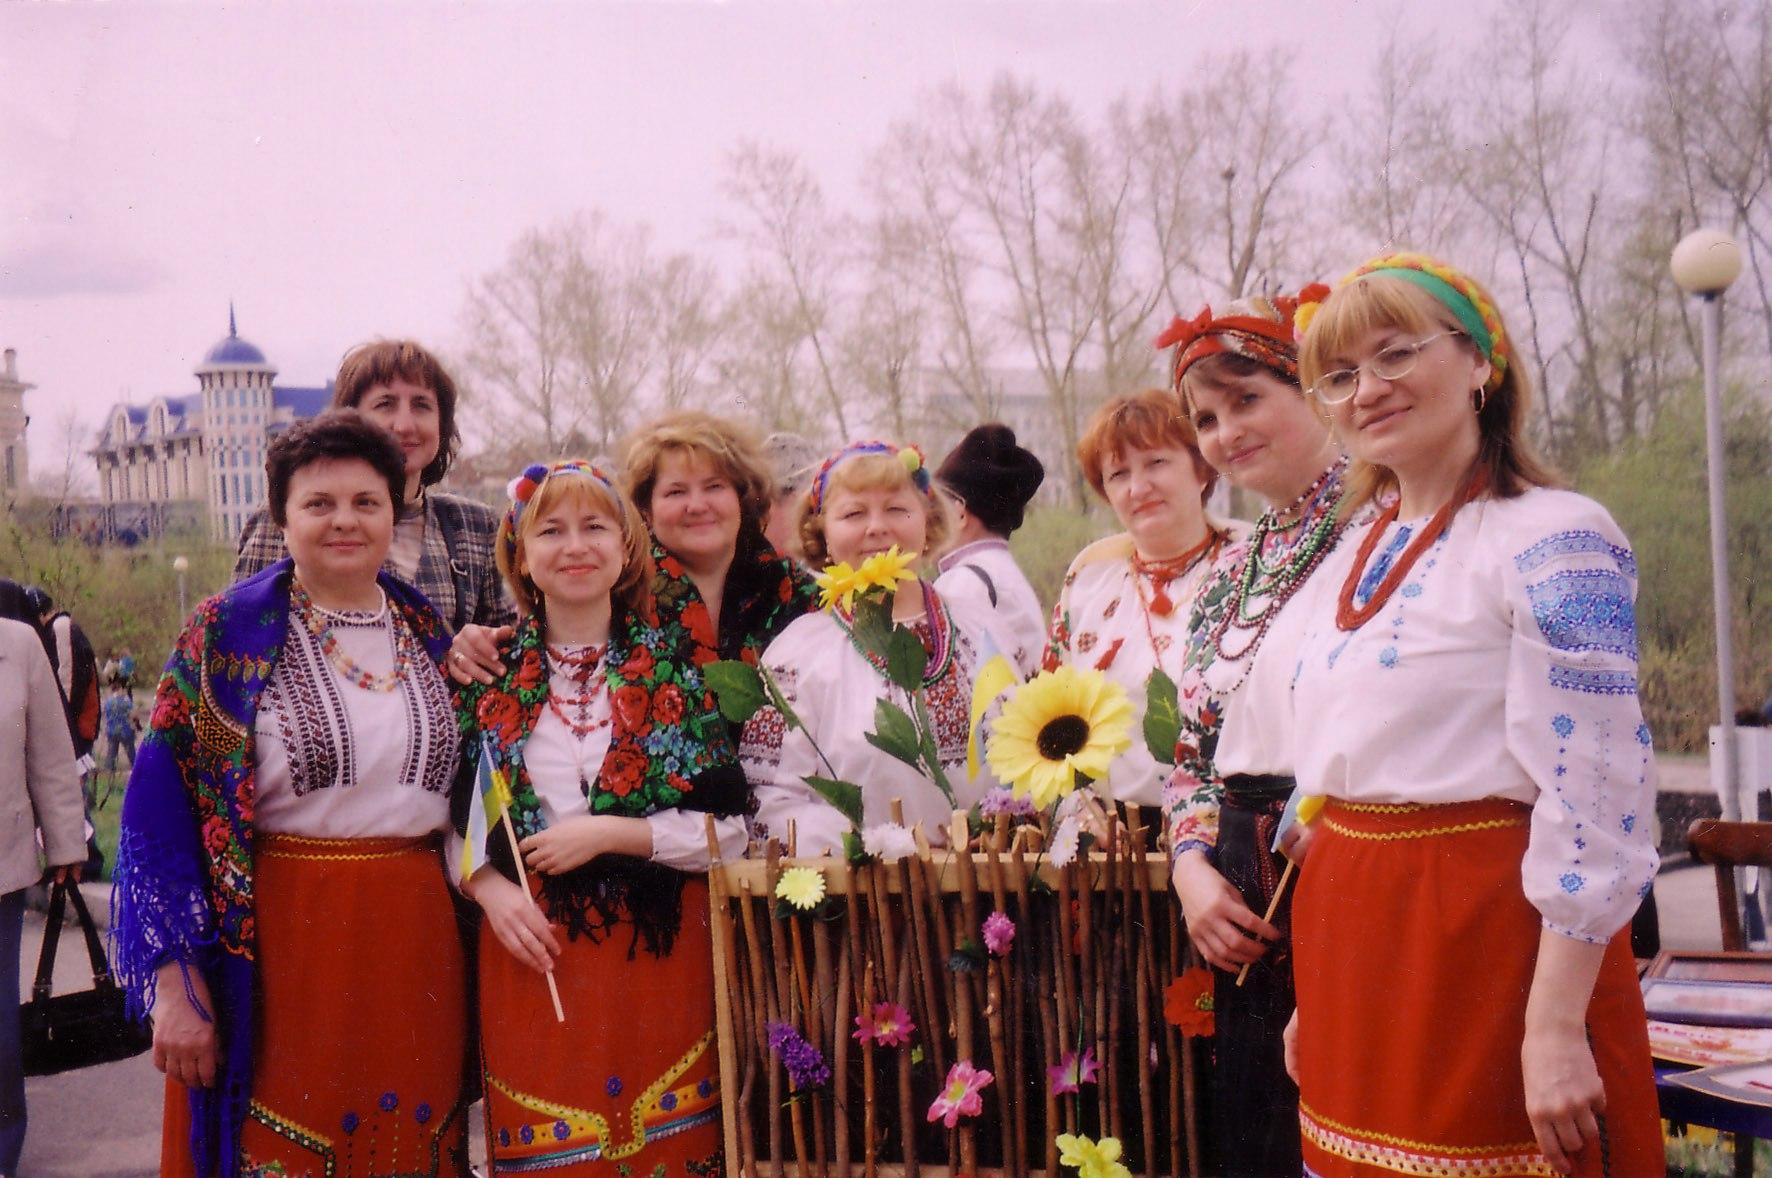 Филиппова Мирослава Орестовна - Участники ансамбля